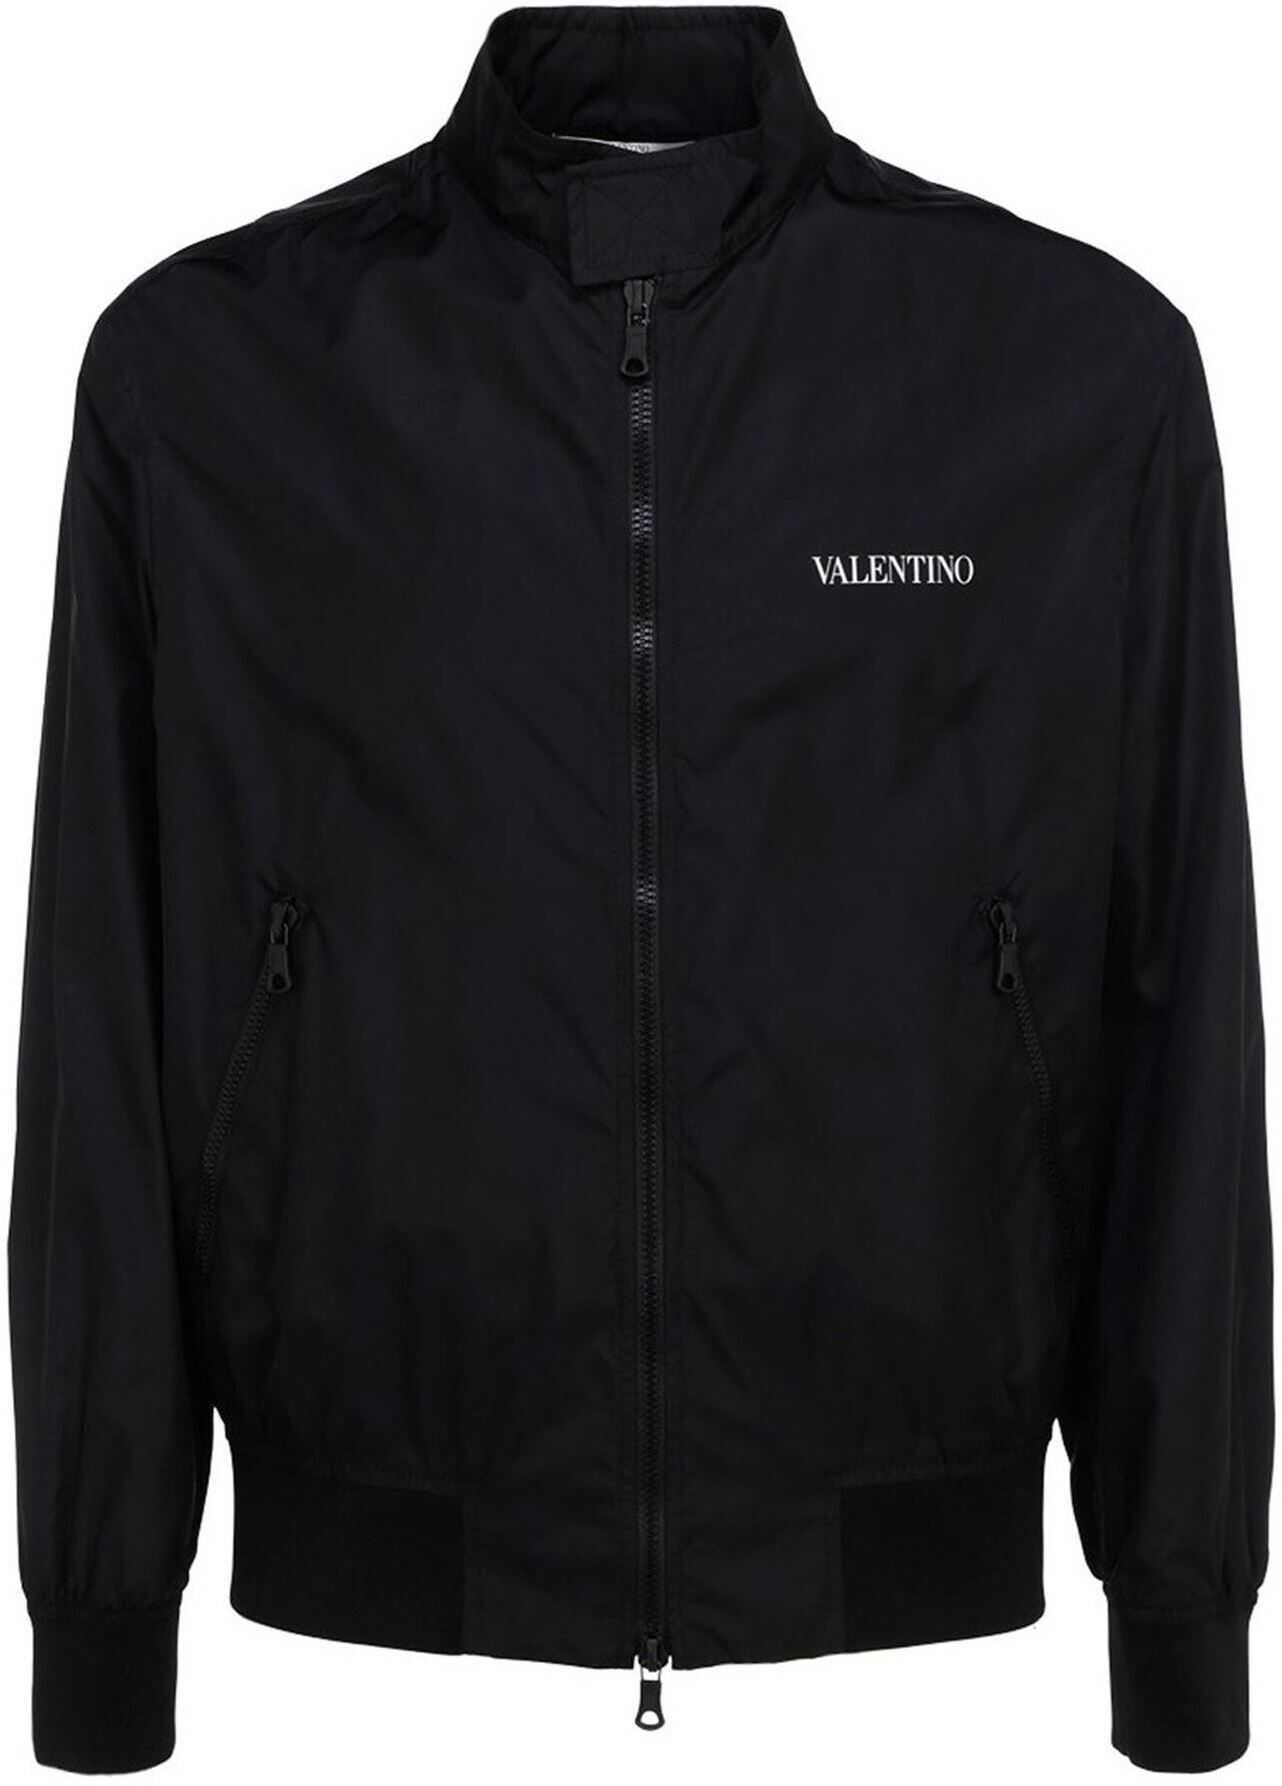 Valentino Garavani Tech Fabric Bomber Jacket In Black Black imagine